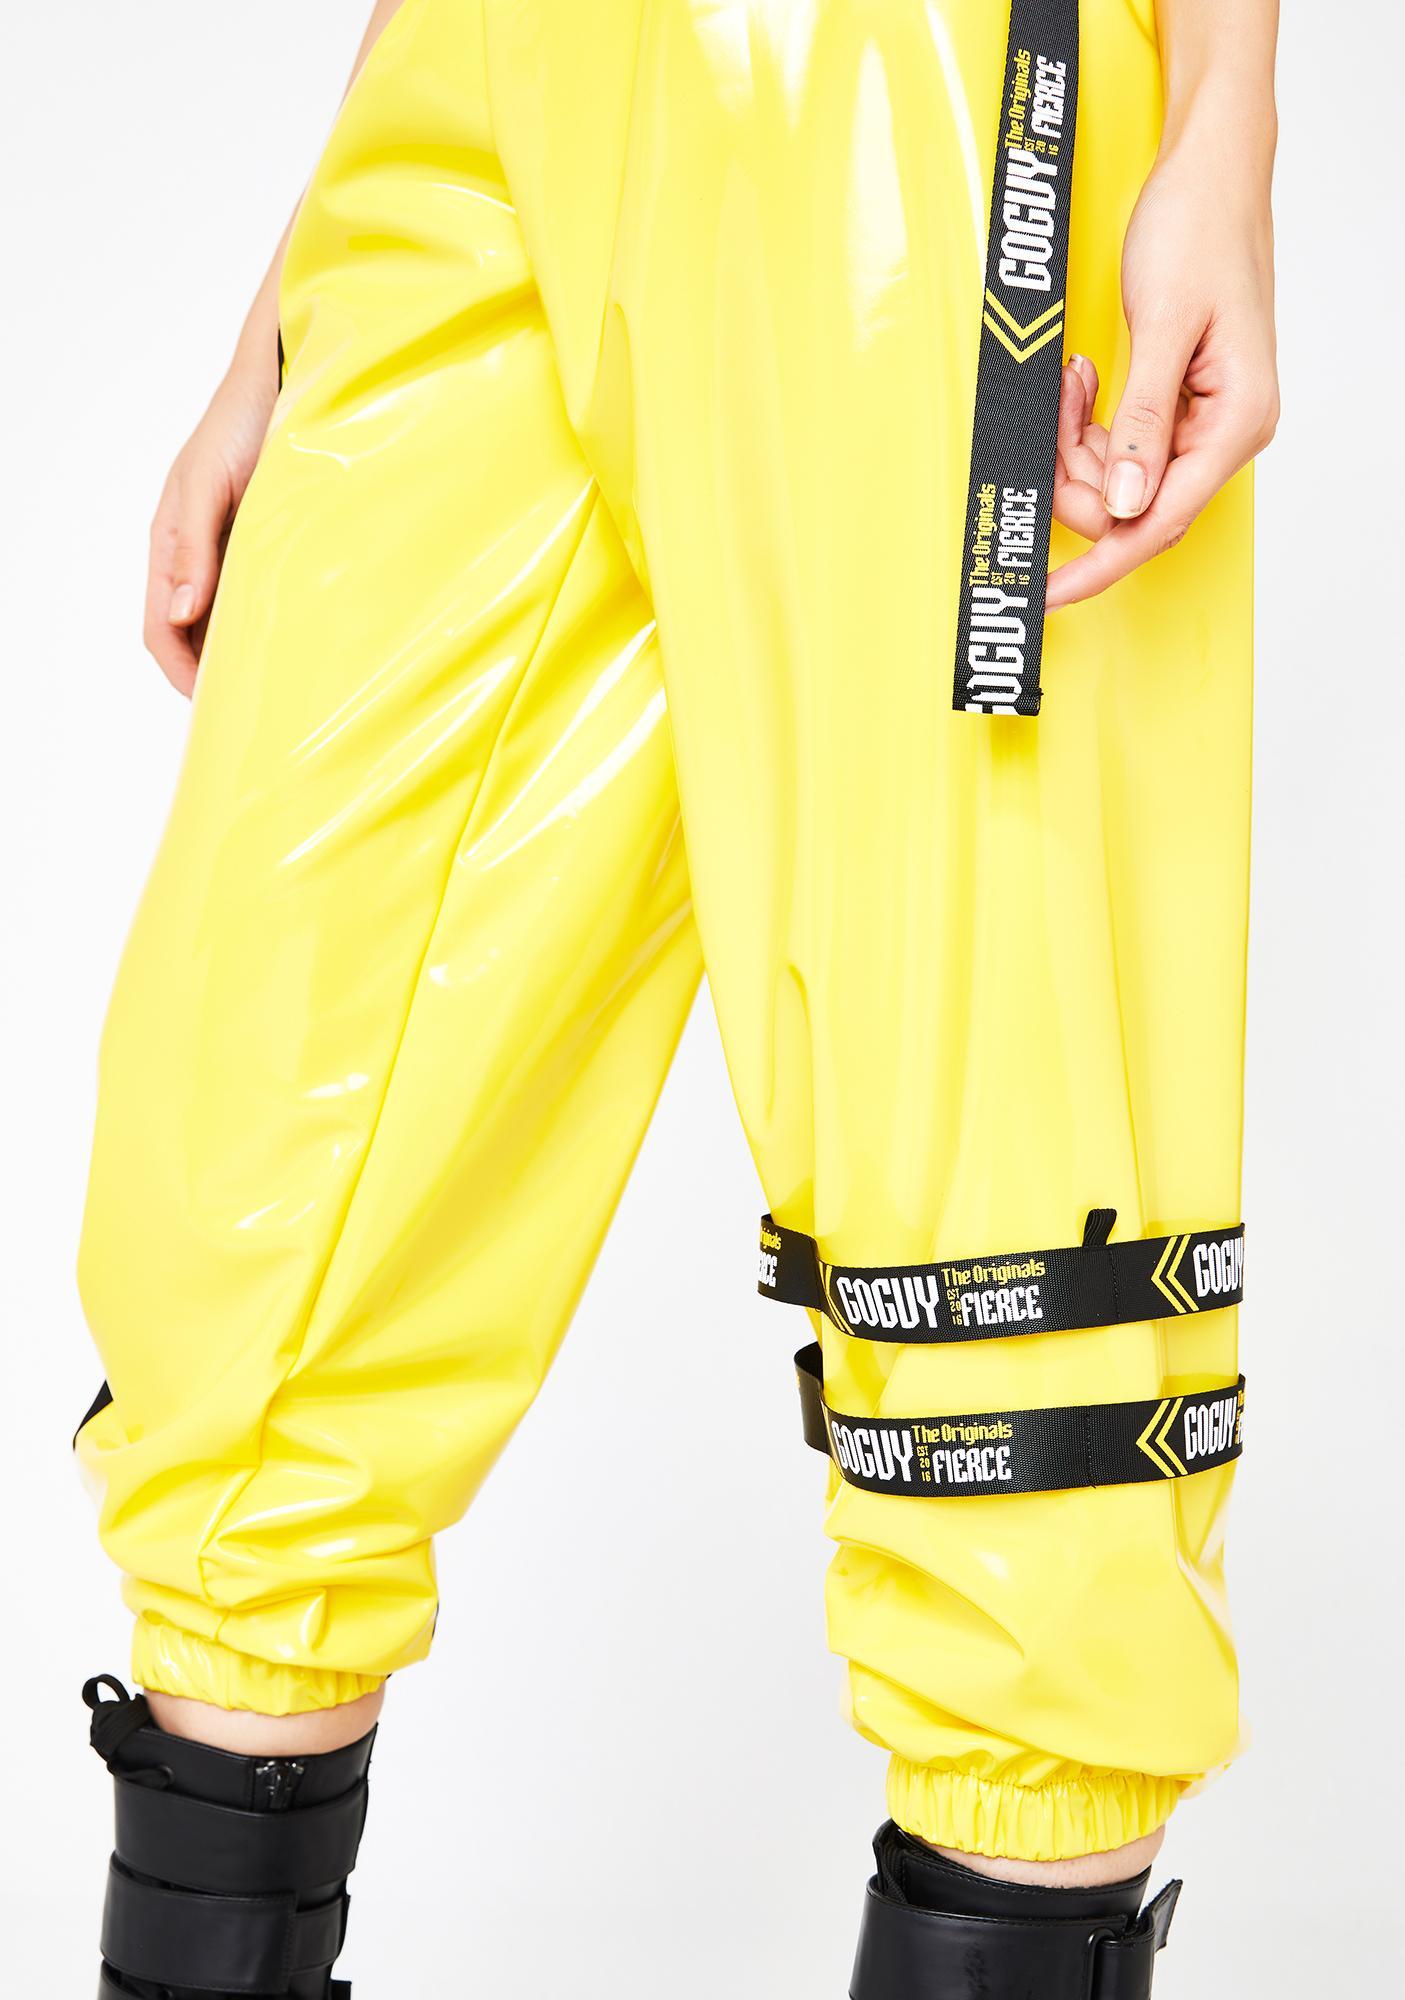 GoGuy Fierce Motocross Yellow Pants